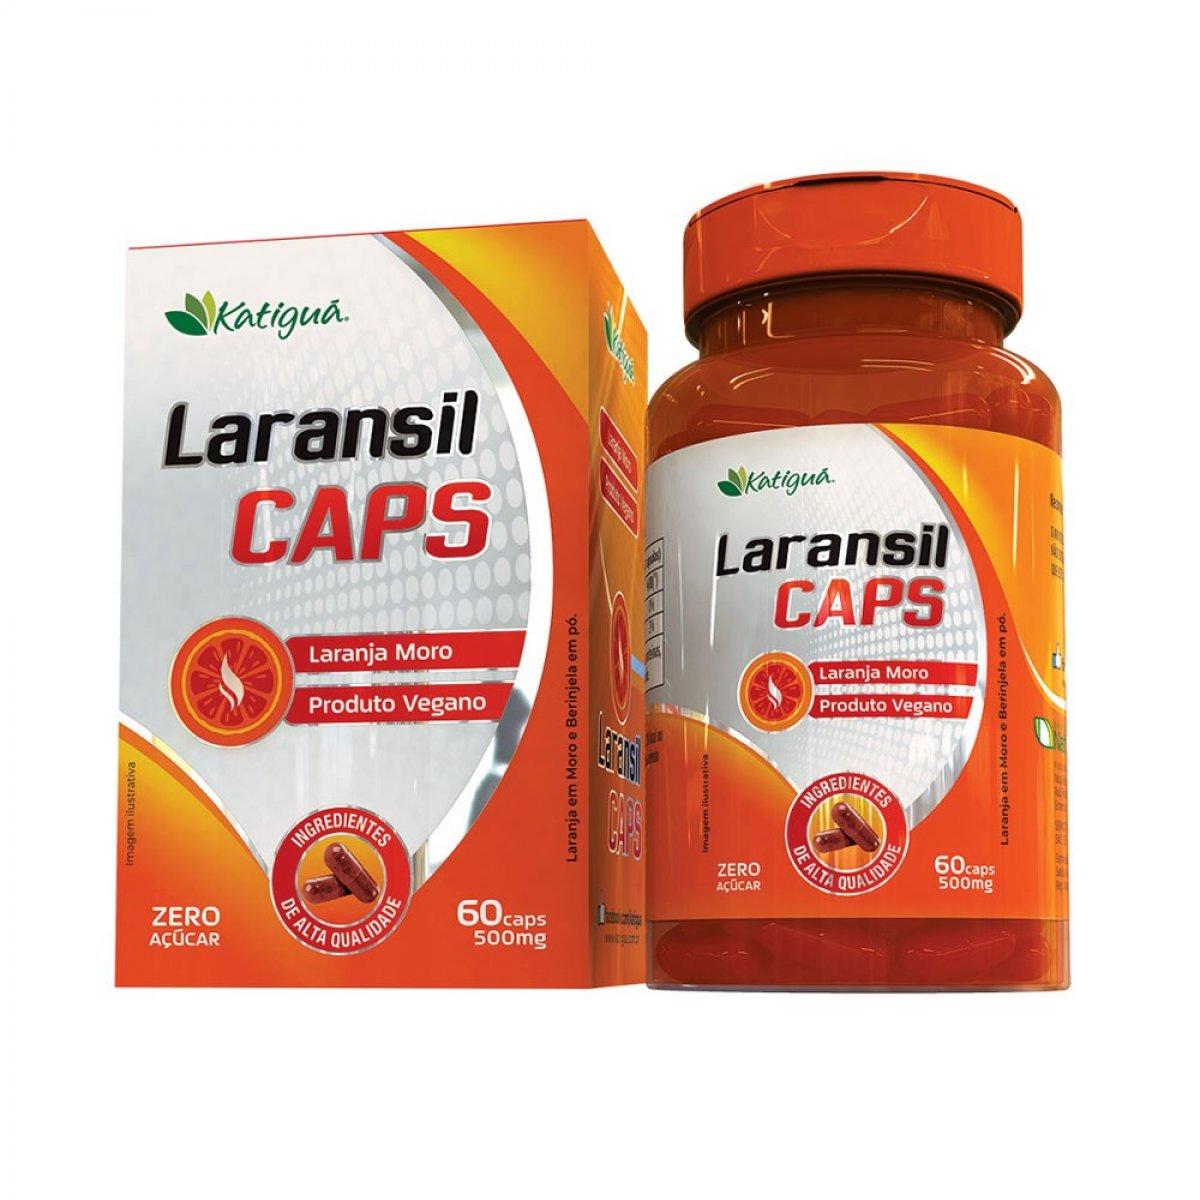 Laransil Caps - Laranja Moro e Berinjela em pó.